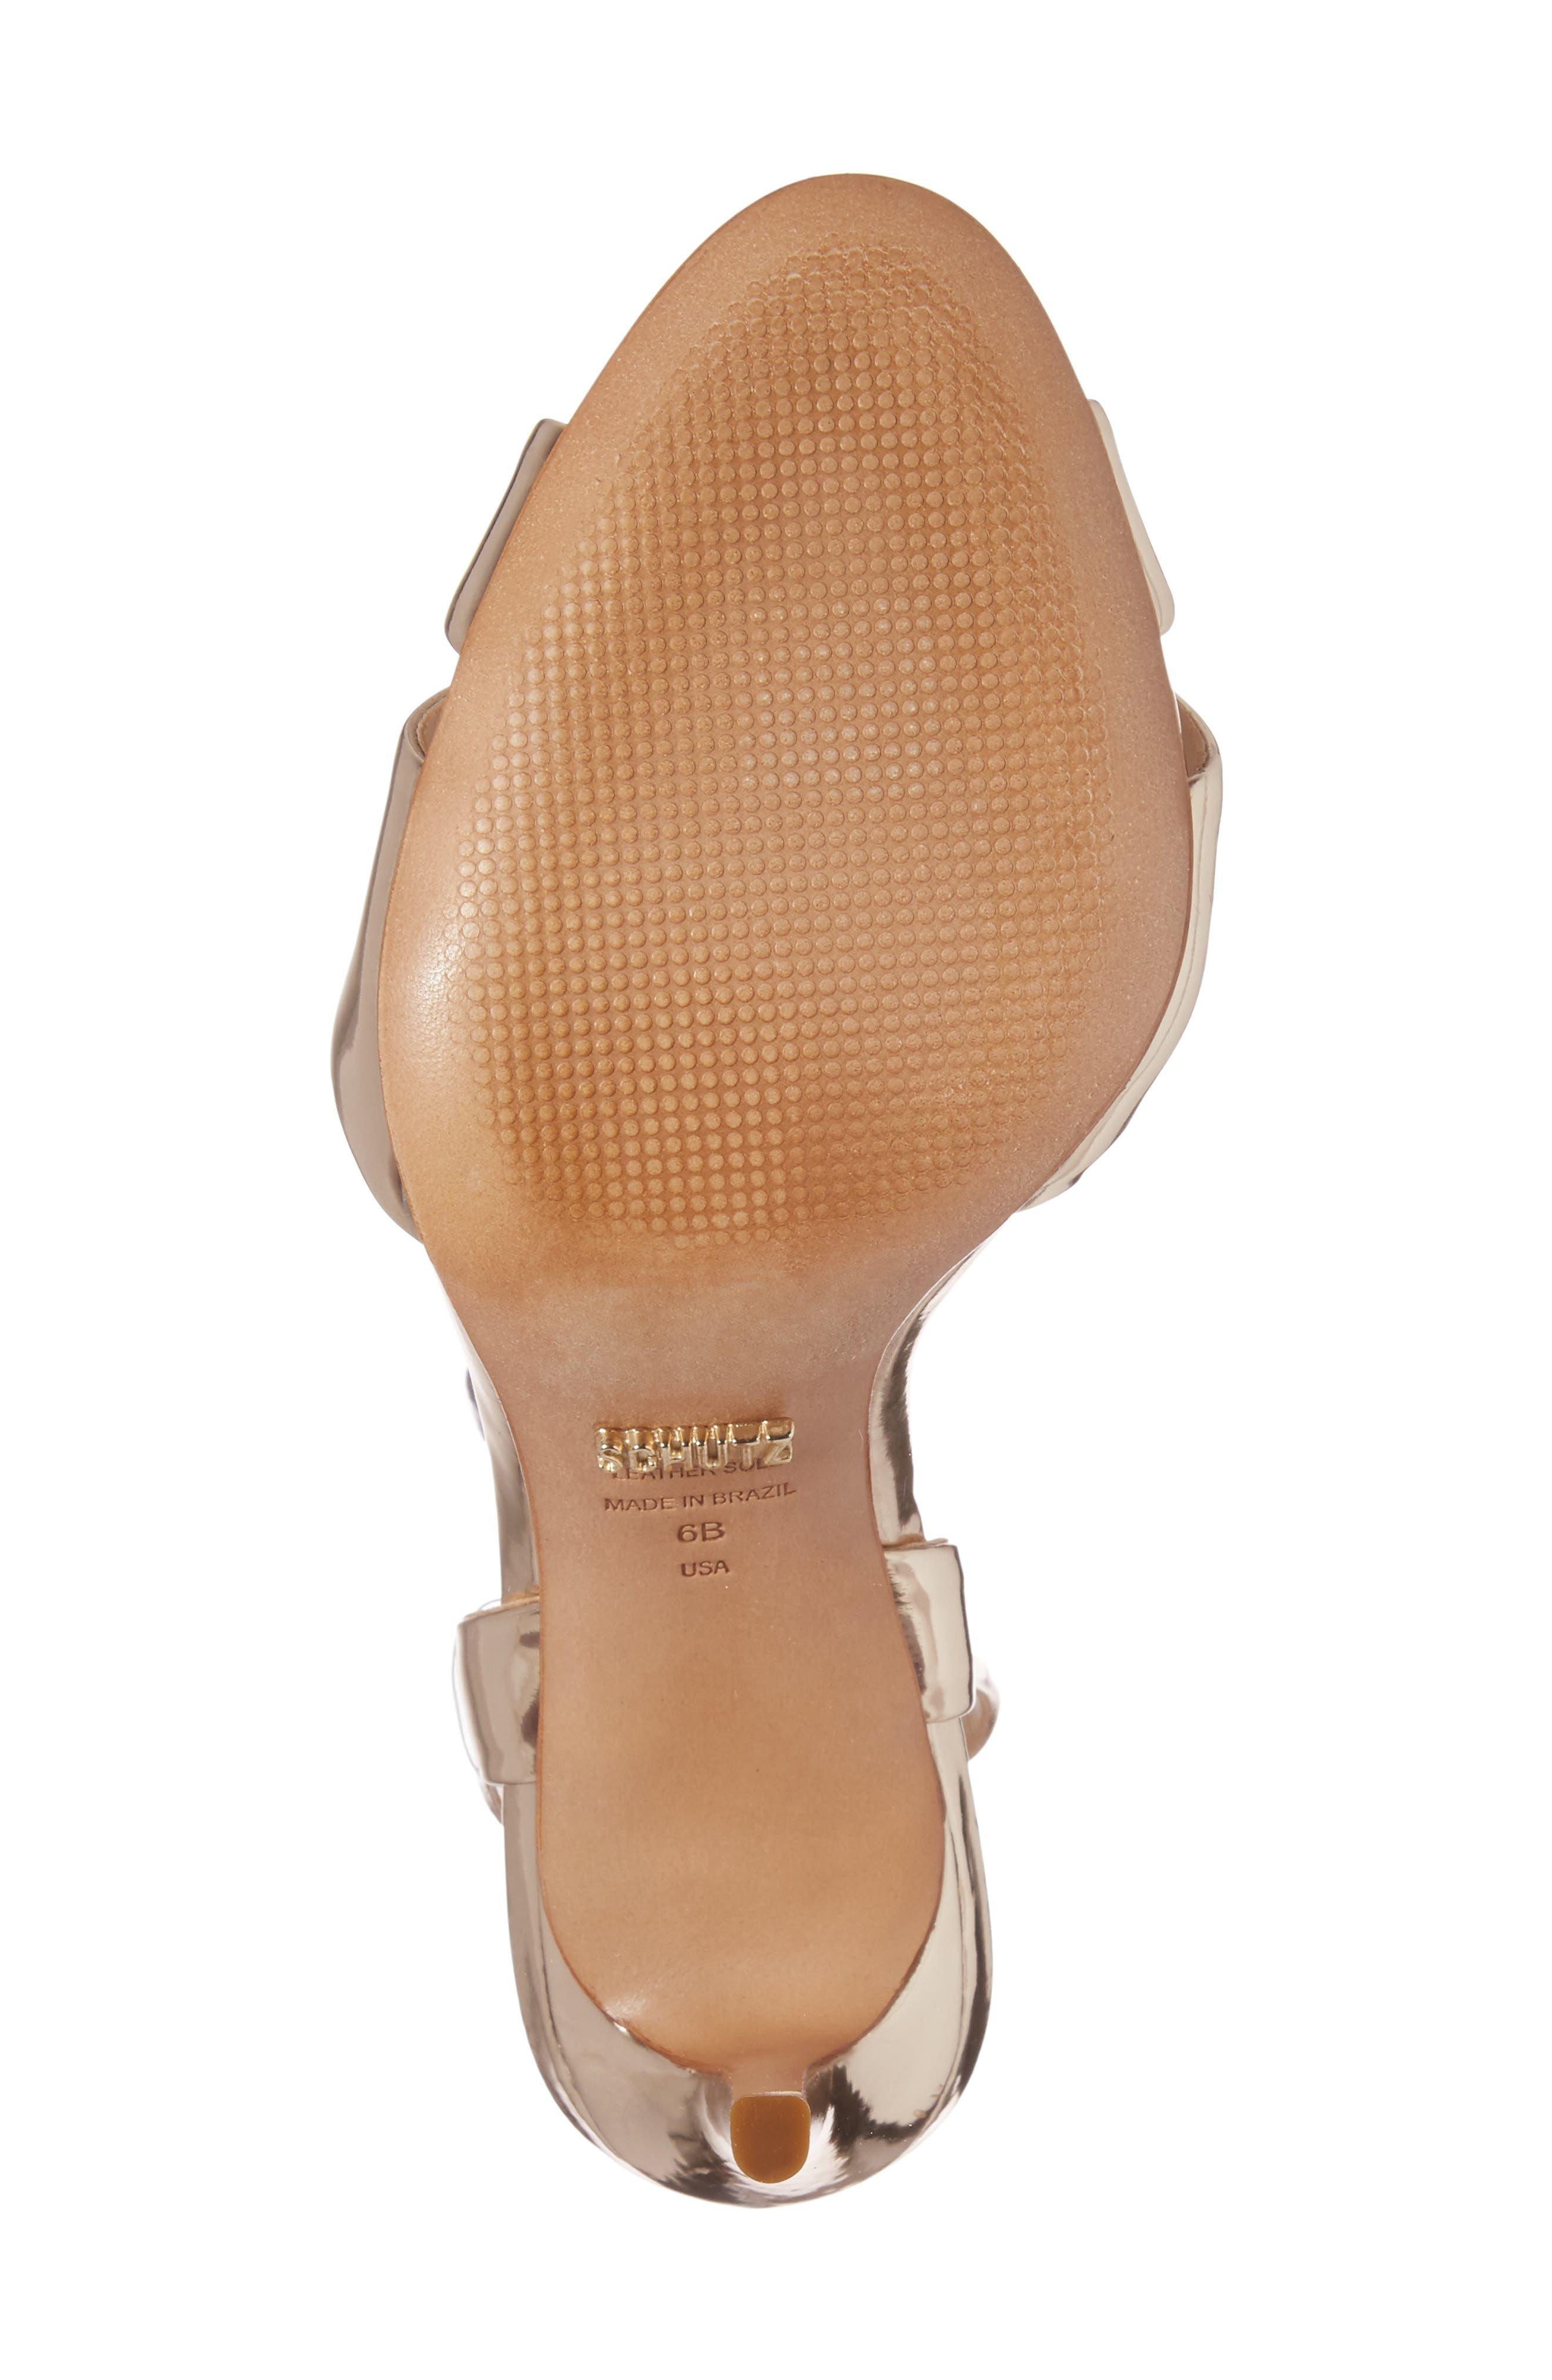 Olyvia Cross Toe Sandal,                             Alternate thumbnail 6, color,                             040